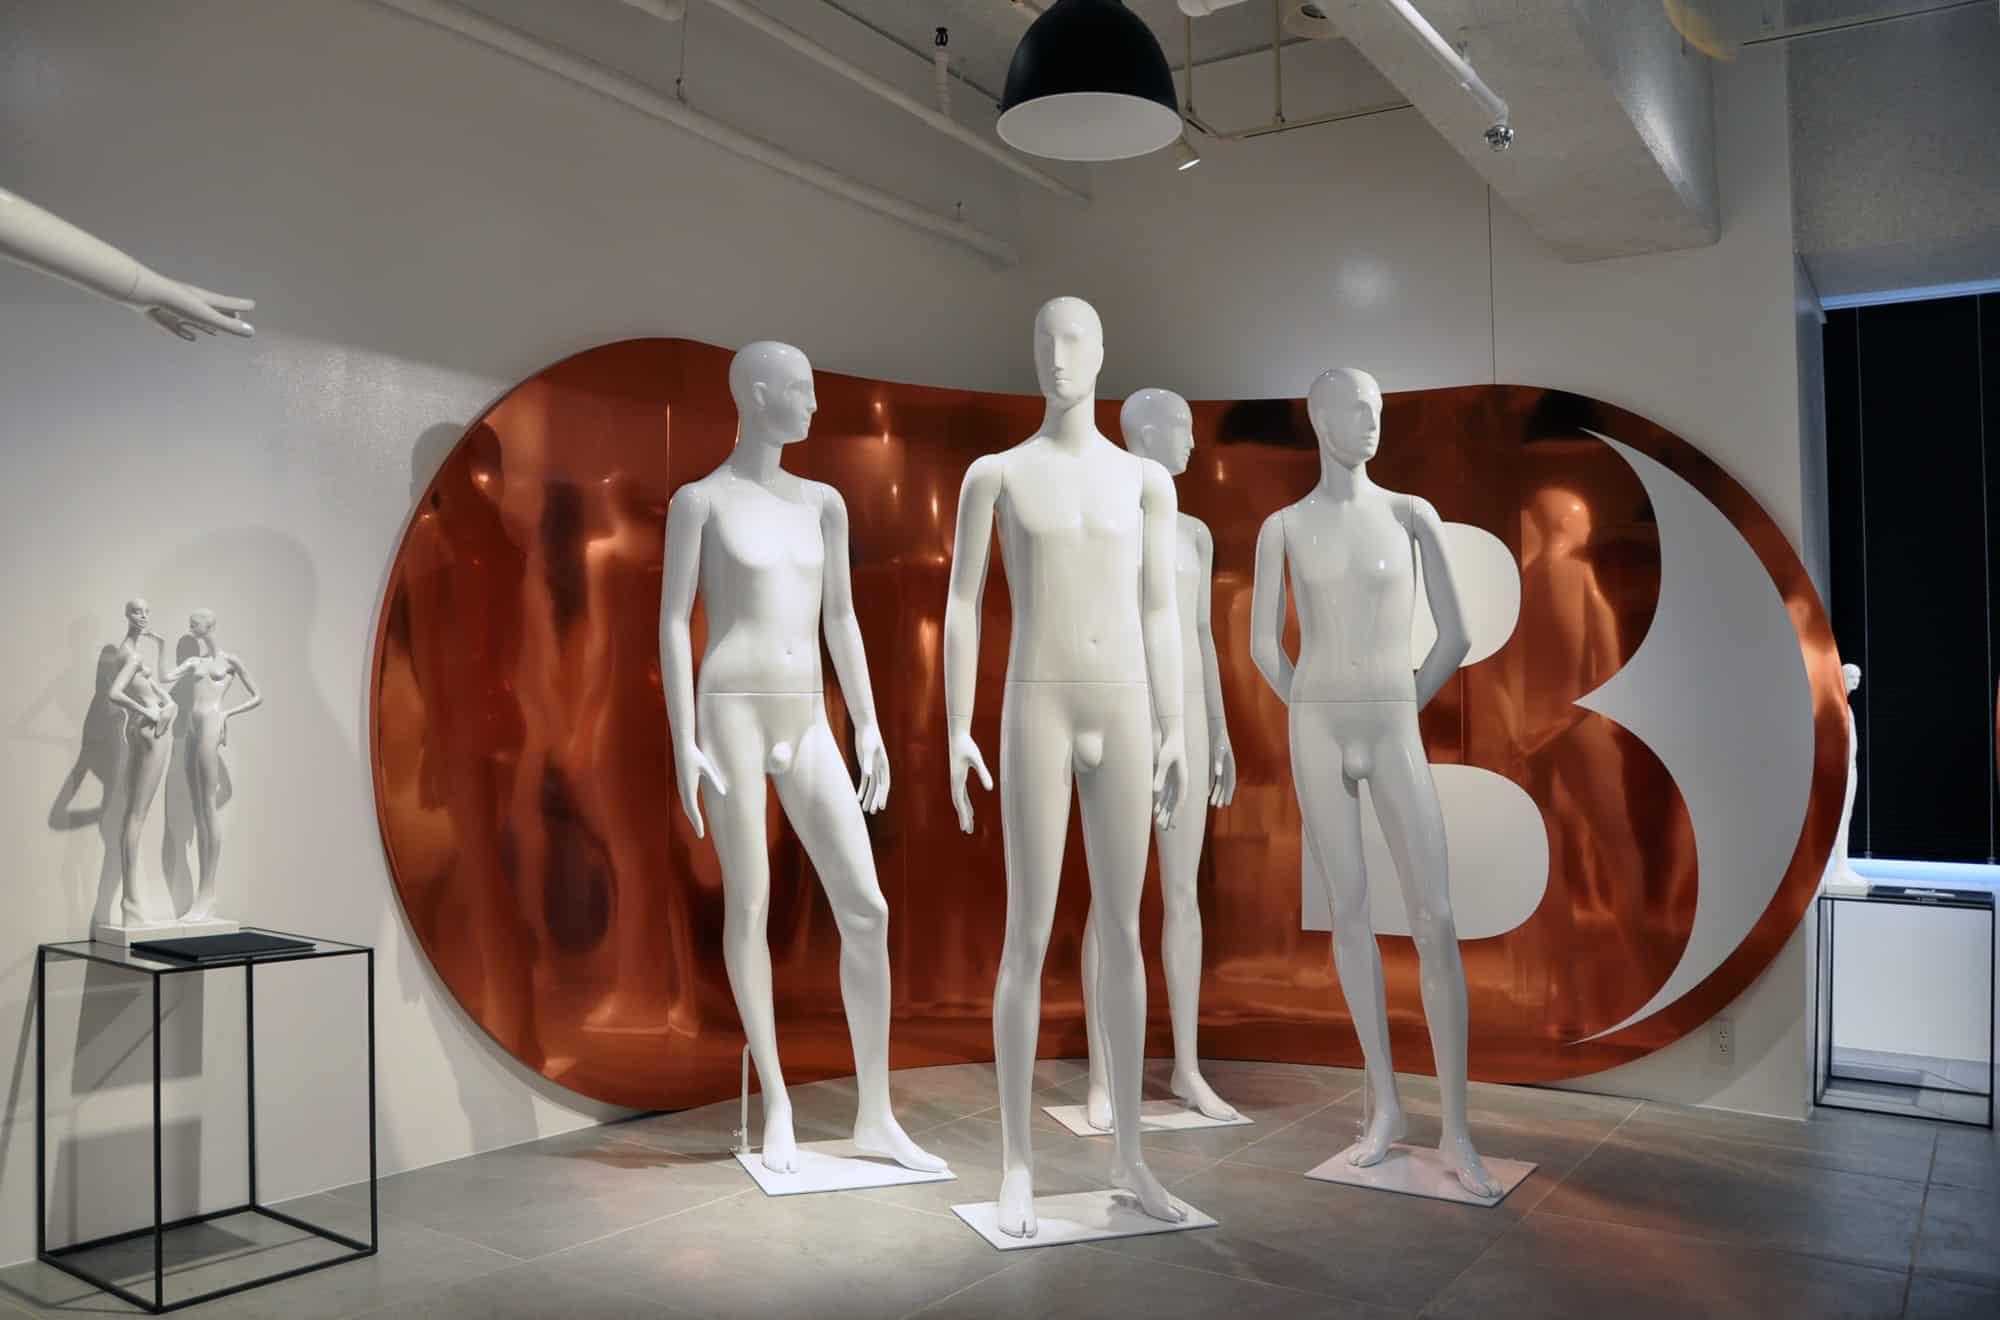 bonaveri mannequin exhibition tokyo japan 05